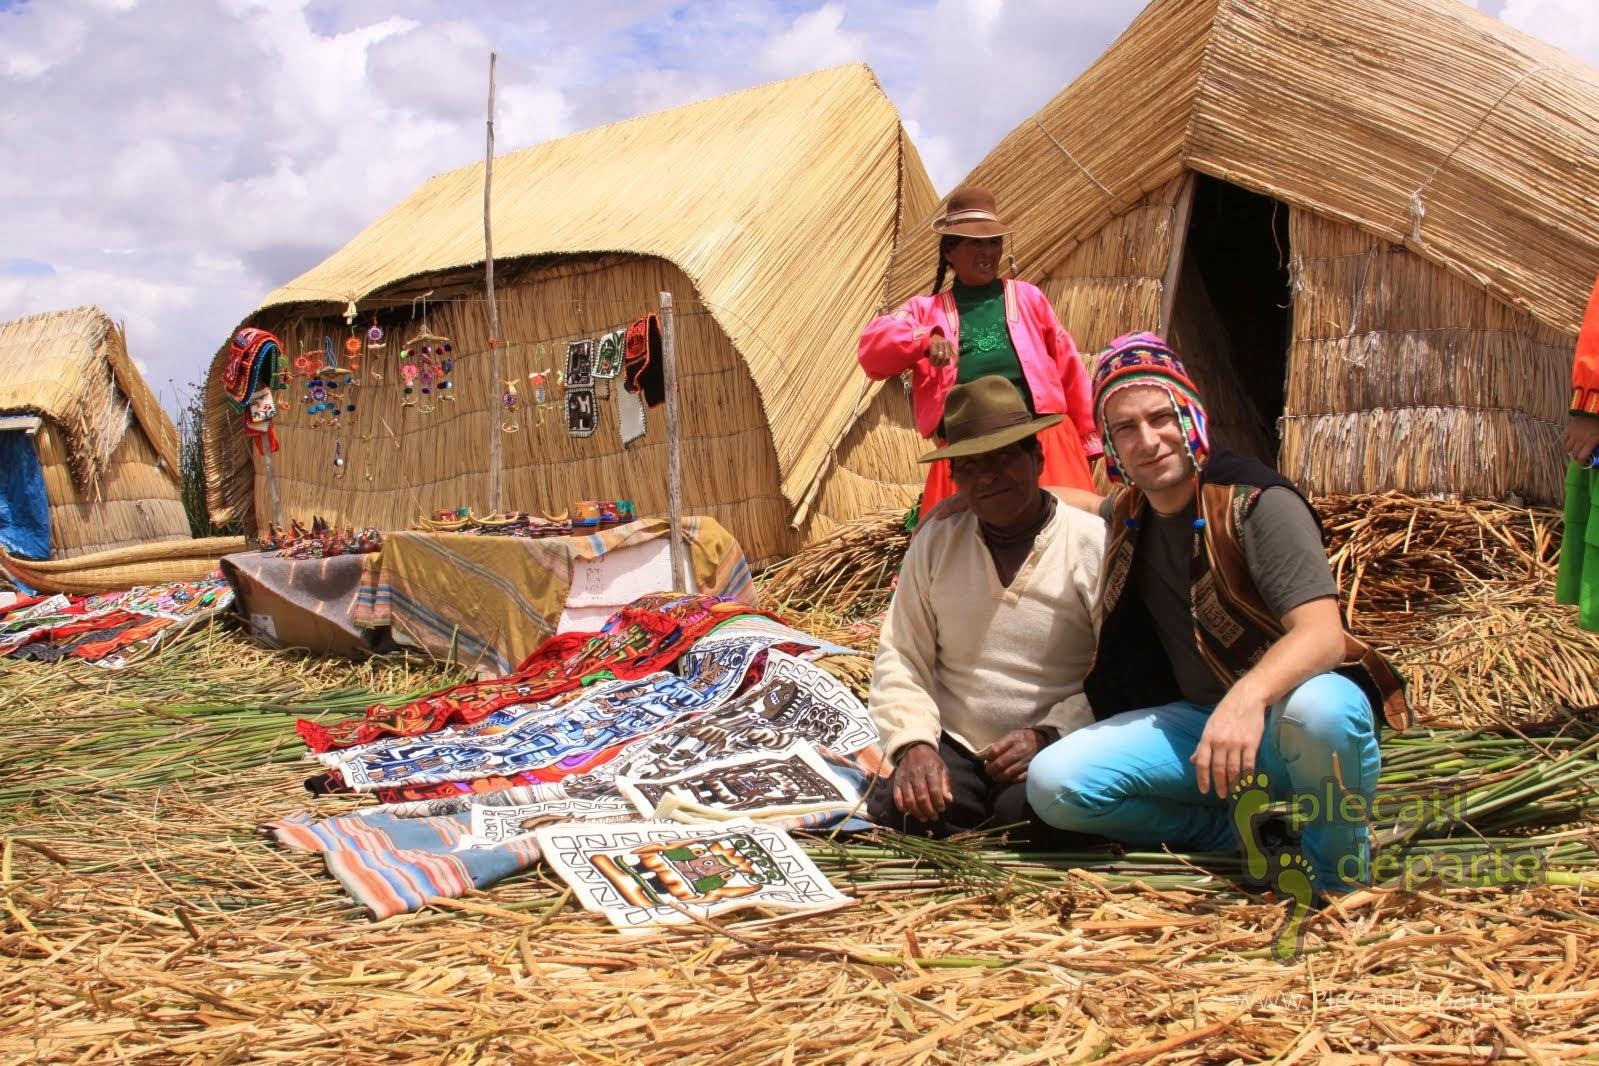 vanzator de suveniruri in comunitatea Los Uros, pe insulele plutitoare, pe Lacul Titicaca, la 4000m in Peru